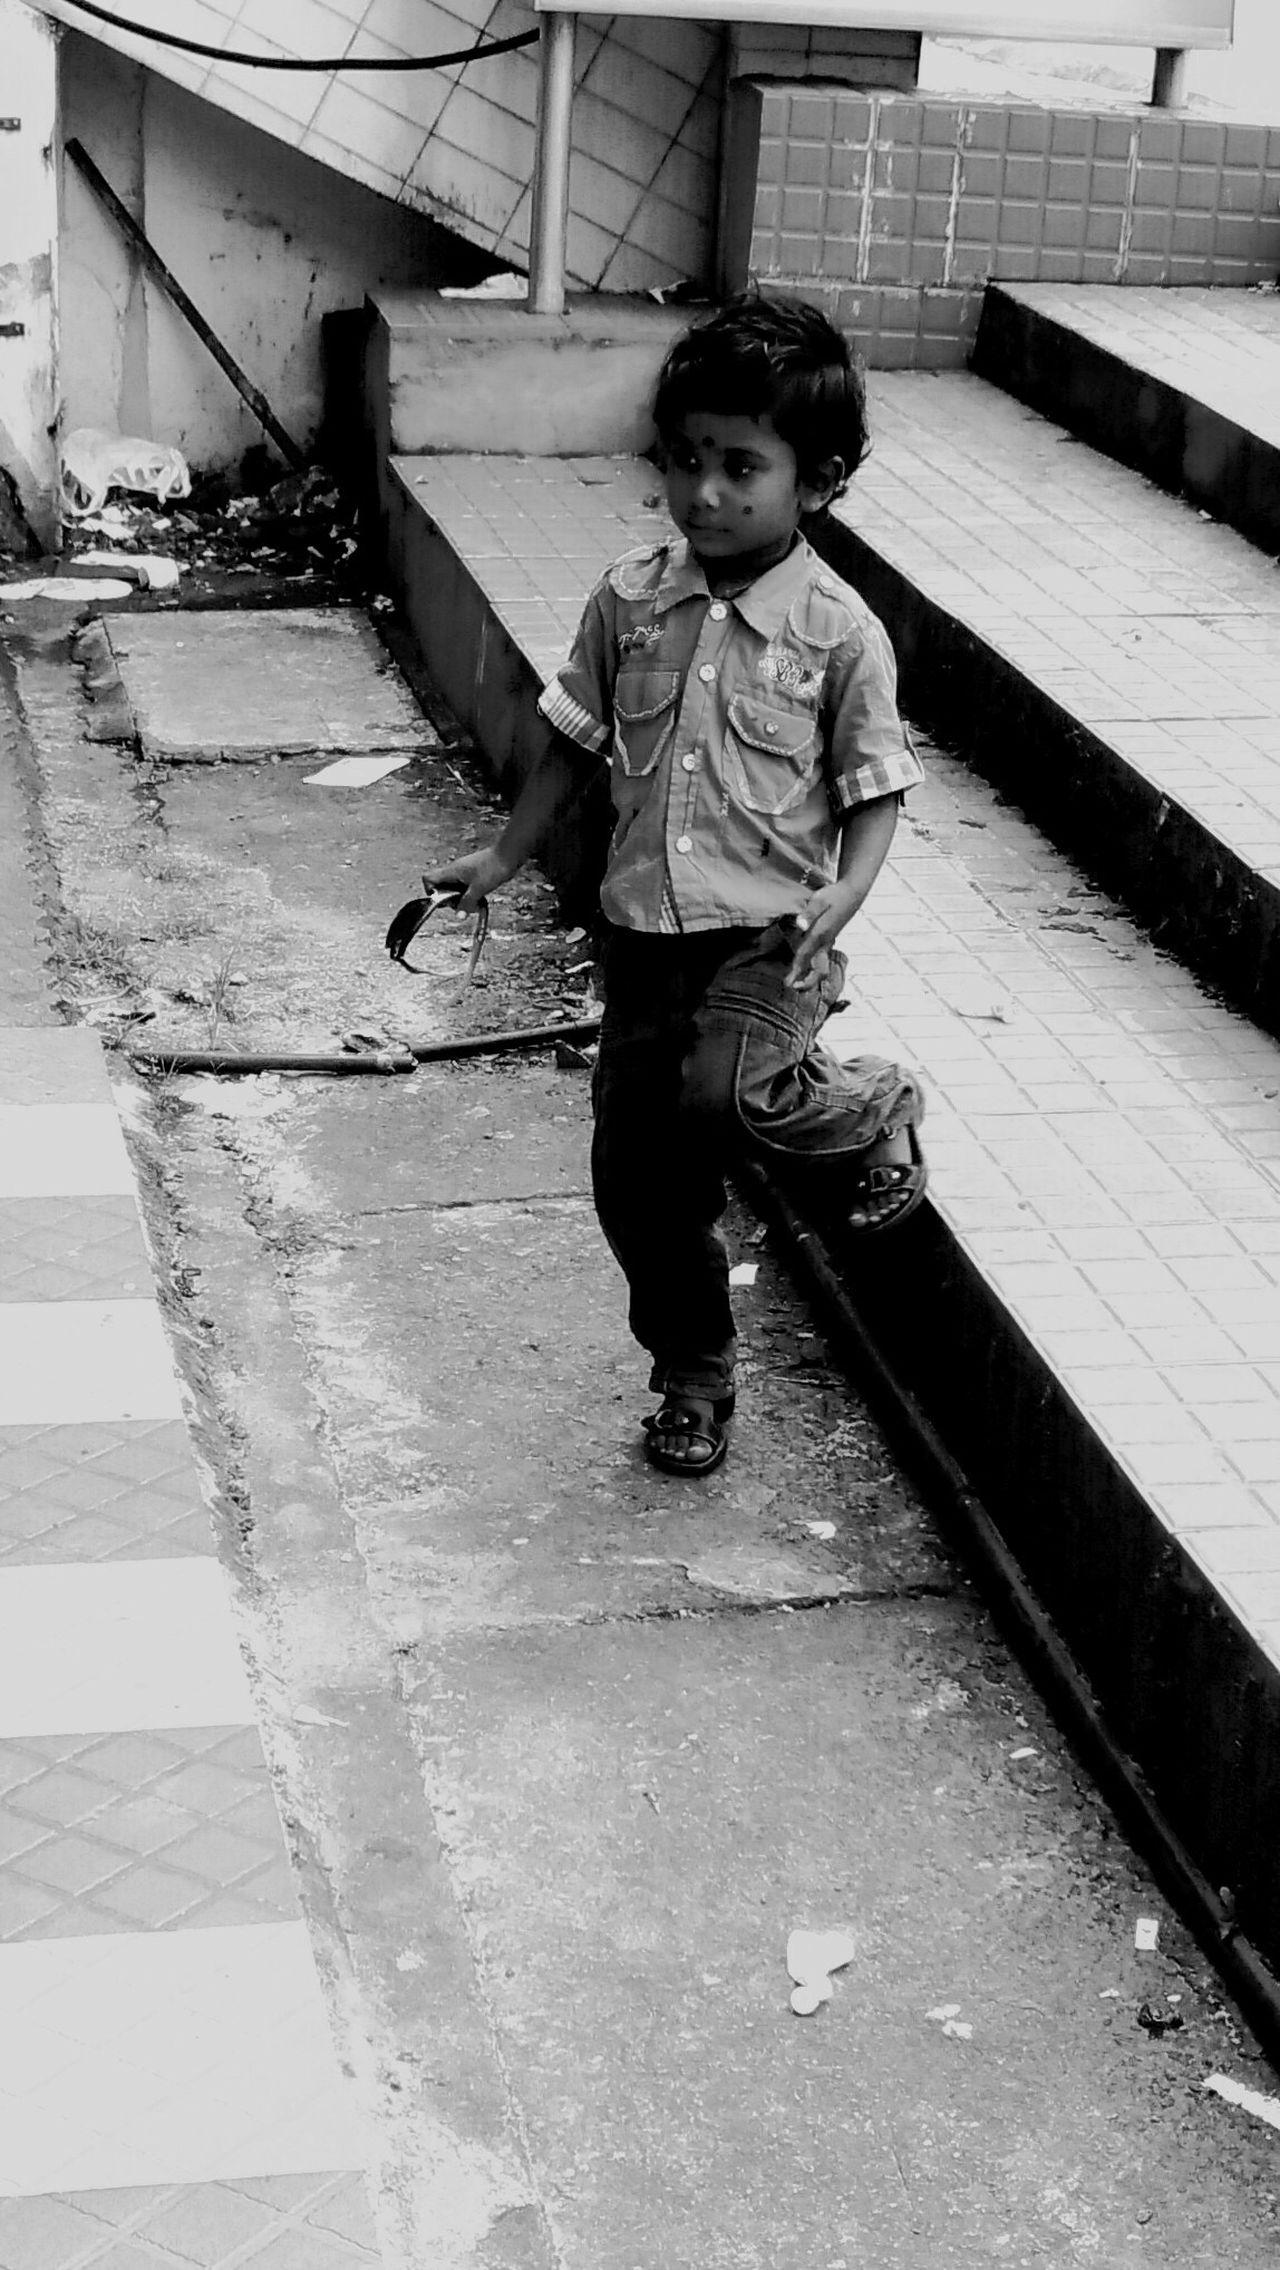 Child Kids Kerala Style India Indian Indian Culture  India_clicks Boys Boy Children Poor  Poorpeople Poor People  Poor Kids Poor Children Poorly Poor Kid EyeEmNewHere EyeEmNewHere